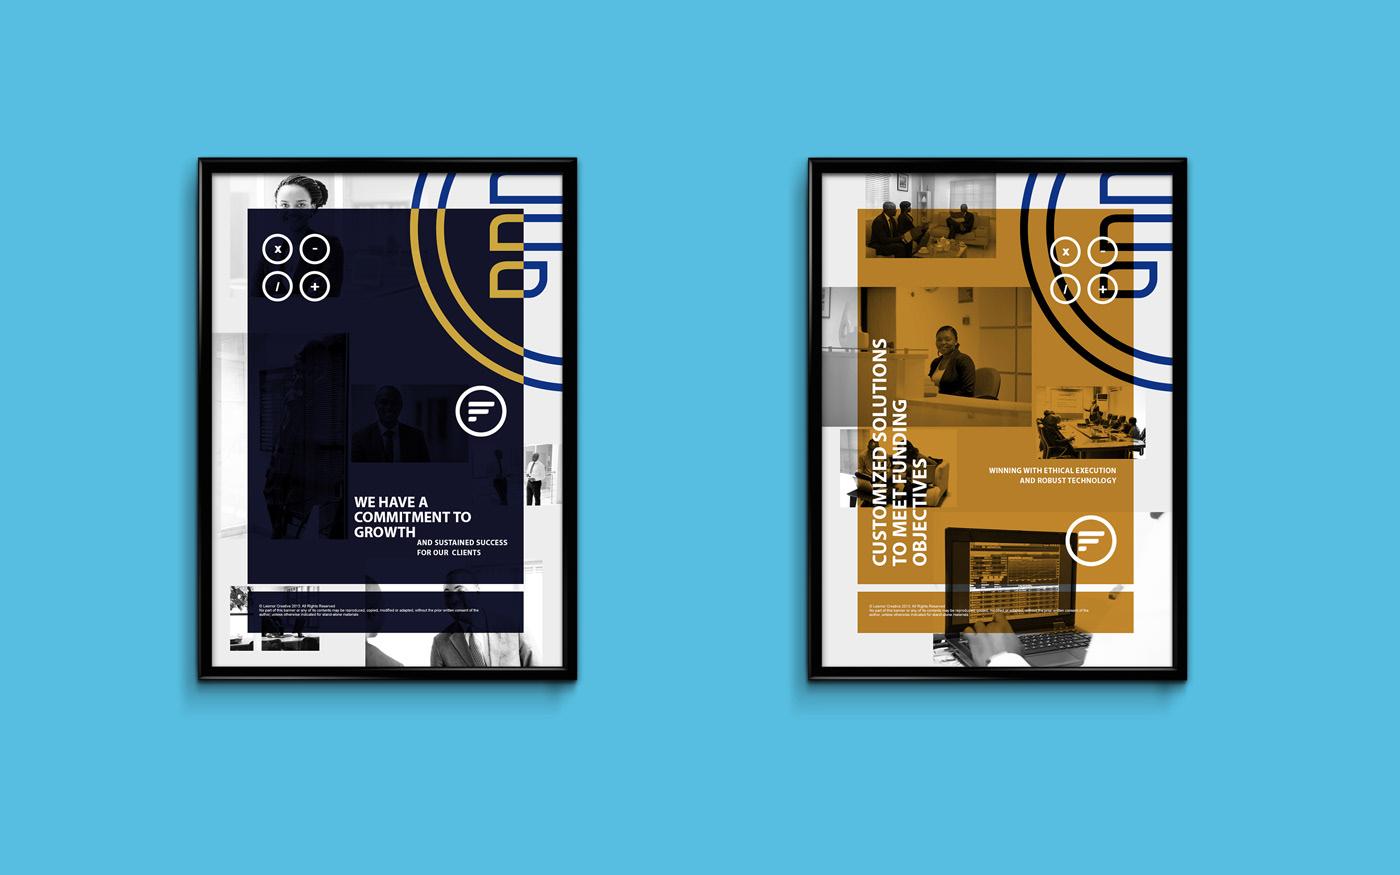 logo,poster,guideline,pattern,gold,blue,futureview,finance,money,chart,Bank,globe,Mockup,design,craft